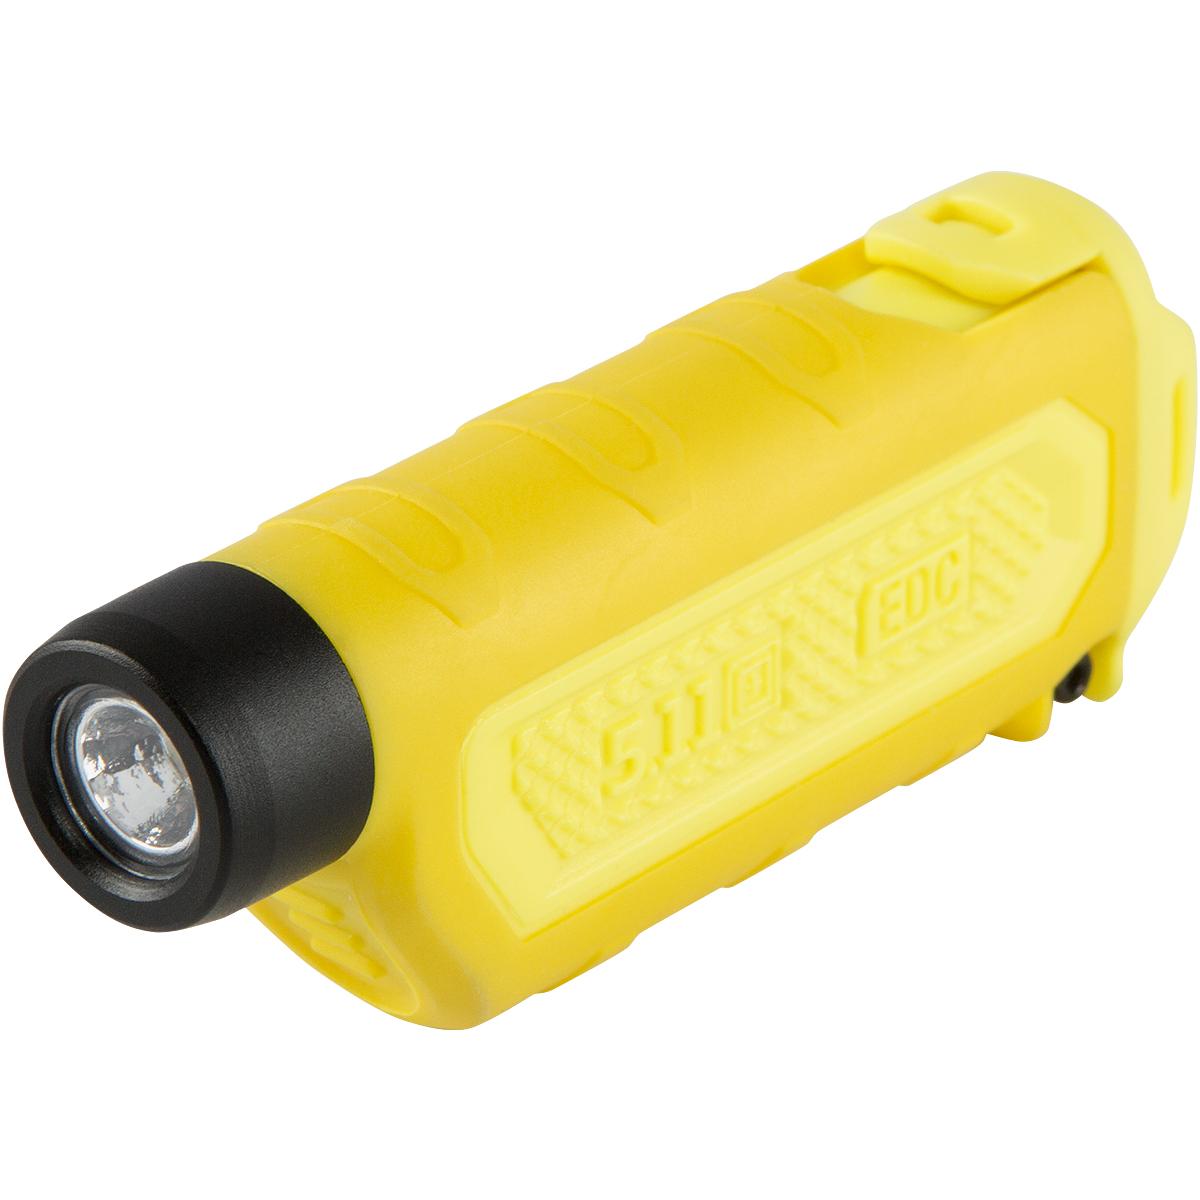 tpt edc led flashlight small travel cree torch safety light traffic yellow ebay